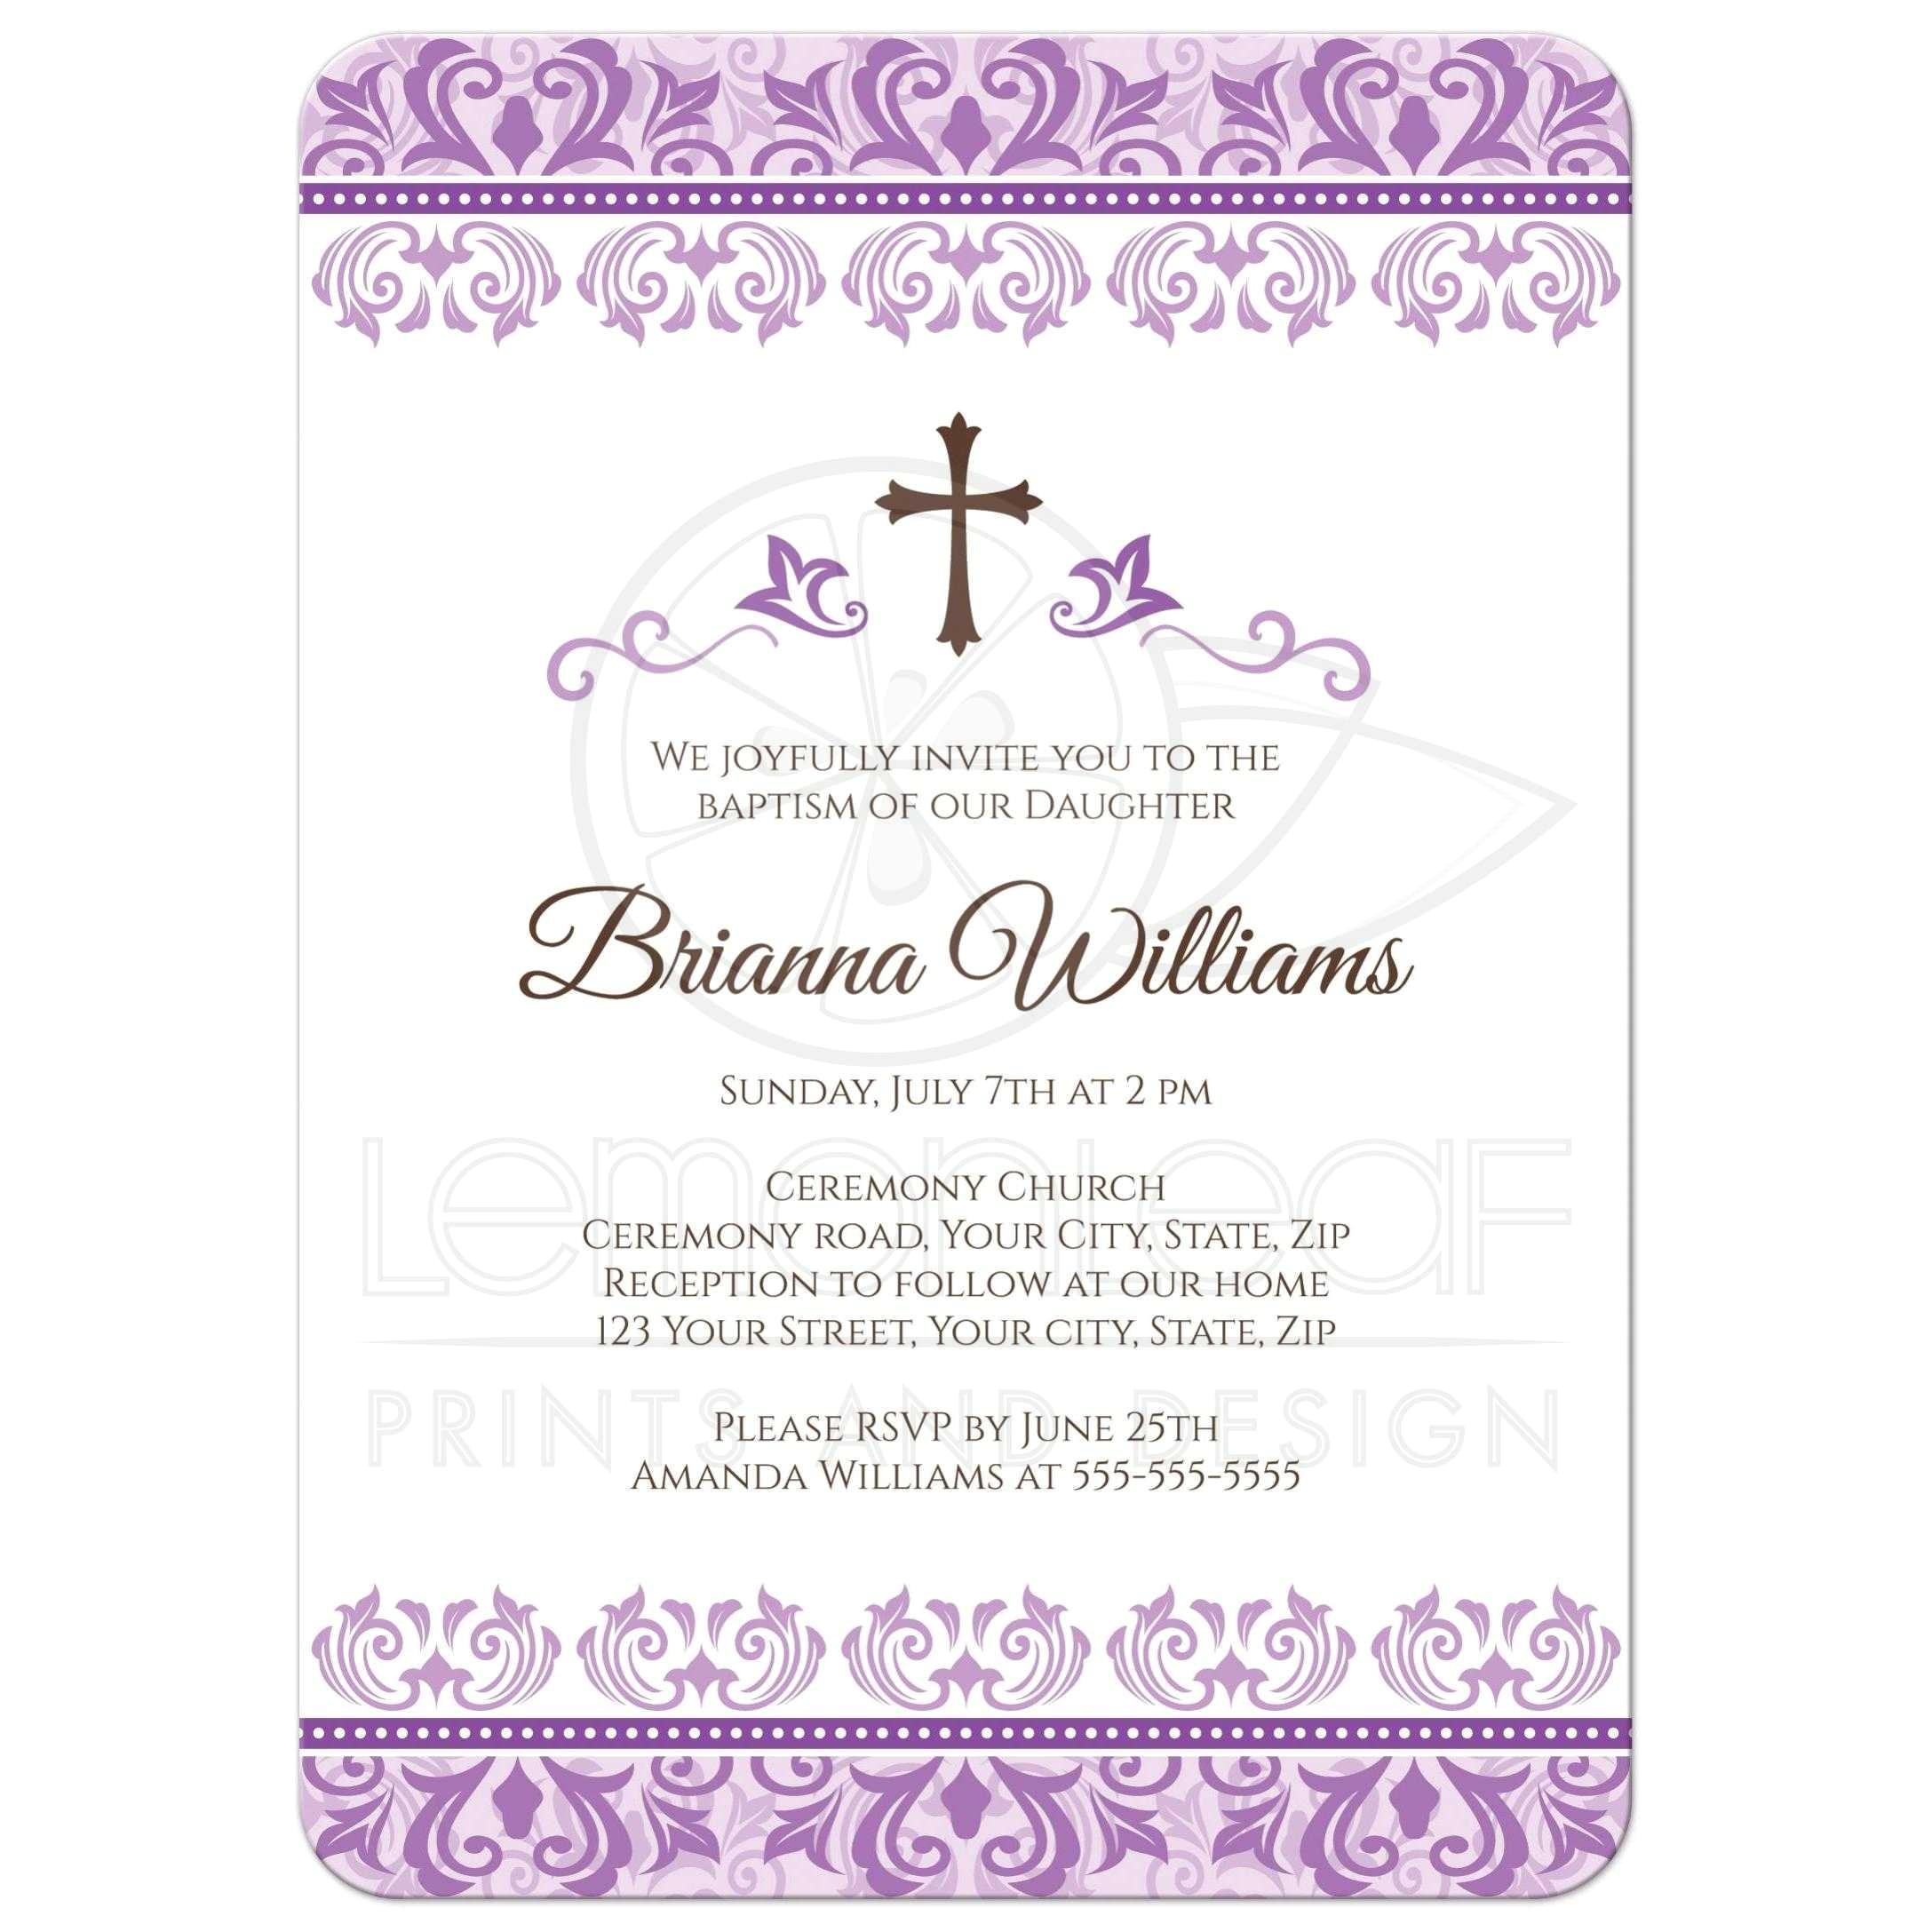 elegant purple damask borders baptism christening invitation for girls